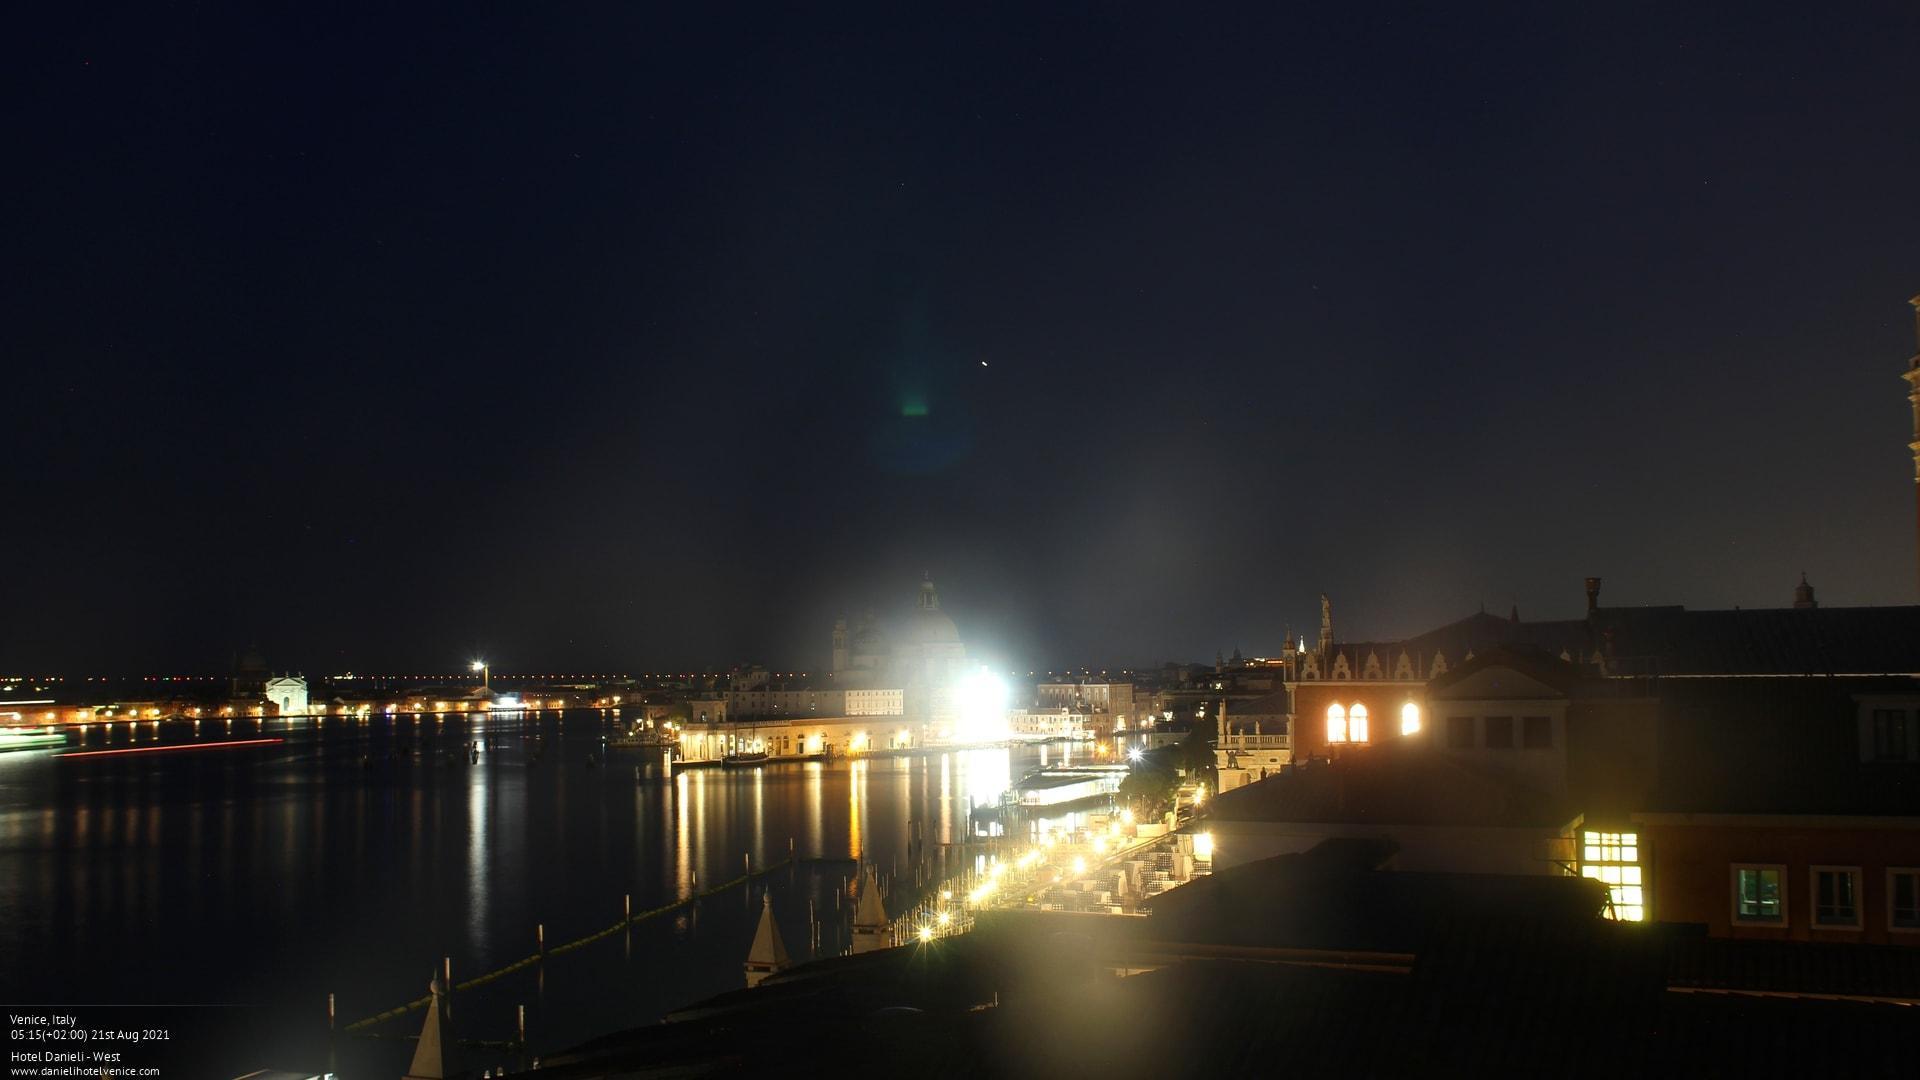 Webcam Venice: Hotel Danieli